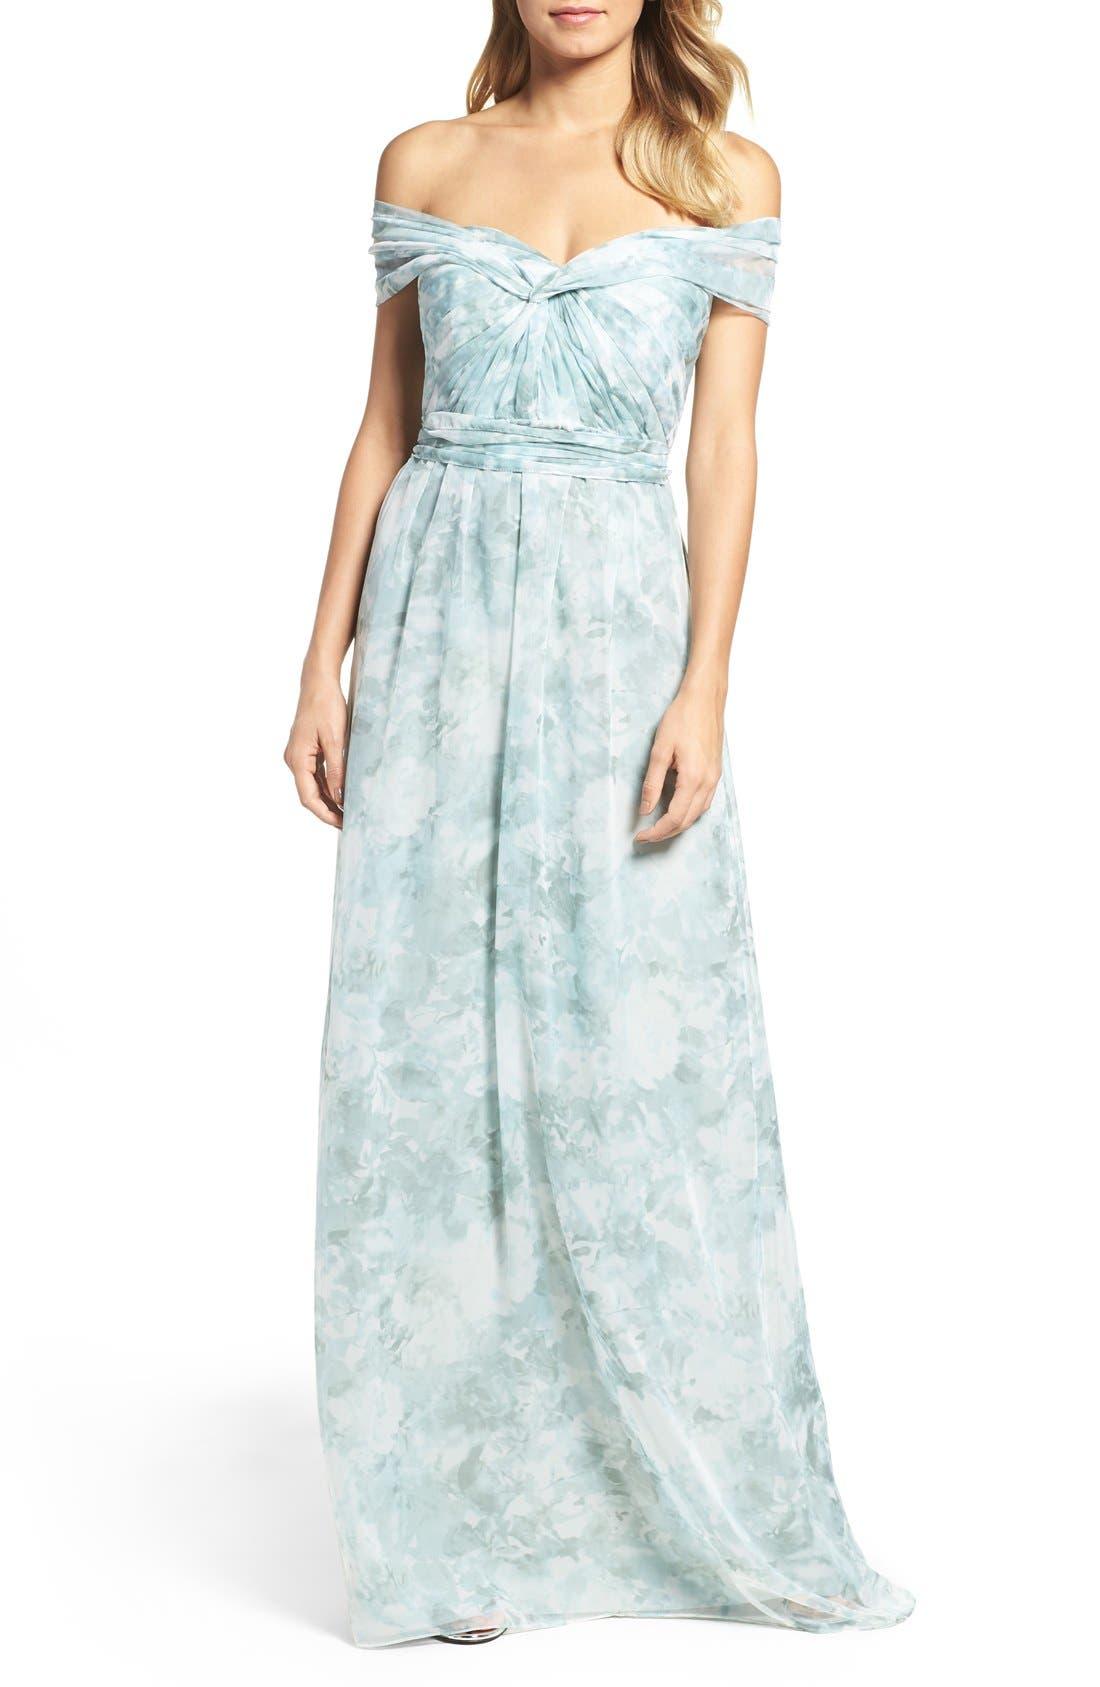 Jenny Yoo 'Nyla' Floral Print Convertible Strapless Chiffon Gown